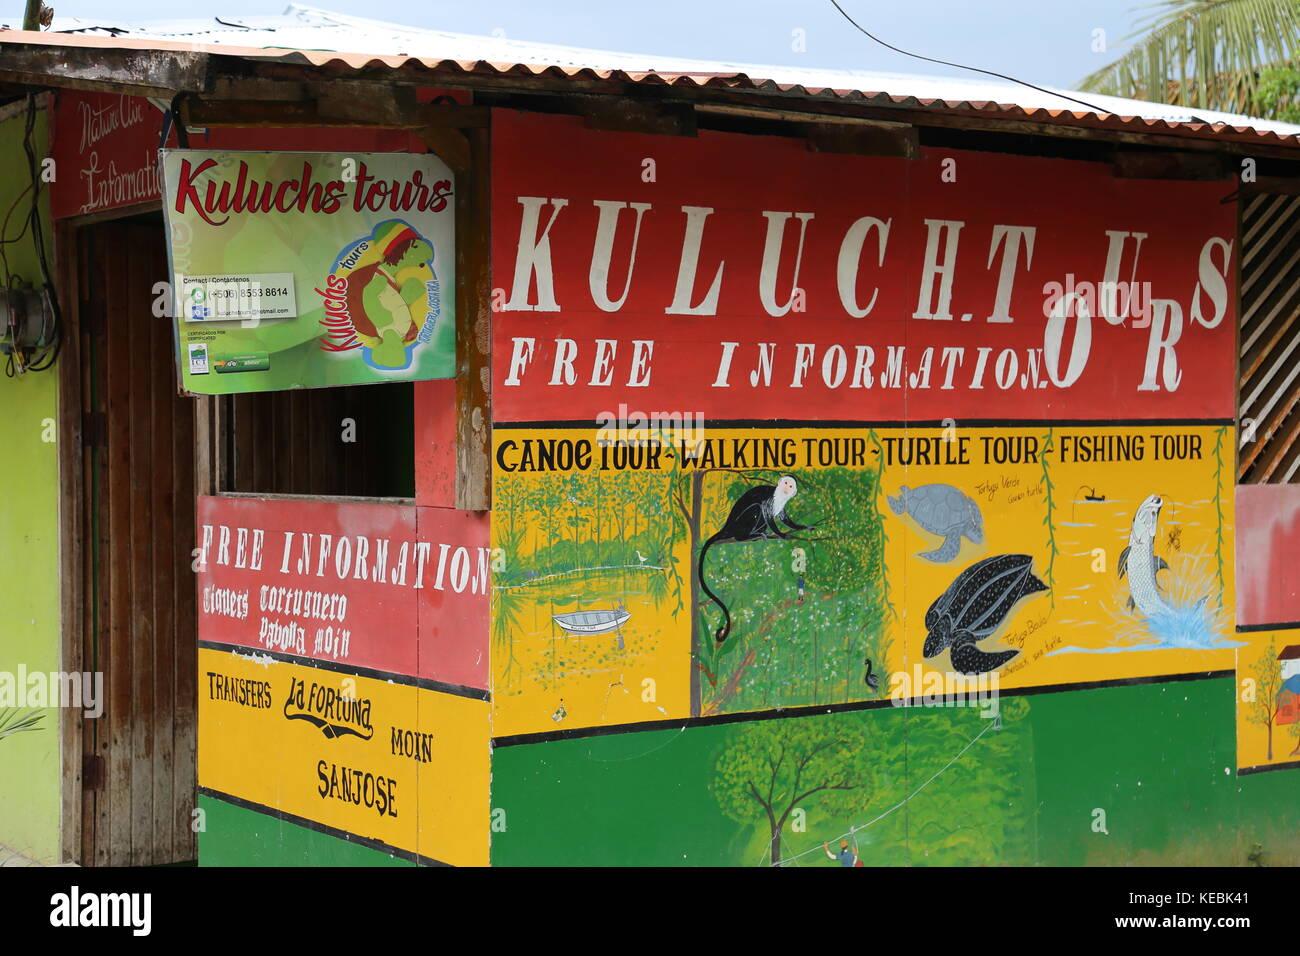 Kuluch's Tours, Tortuguero village centre, Limón province, Caribbean Sea, Costa Rica, Central America - Stock Image